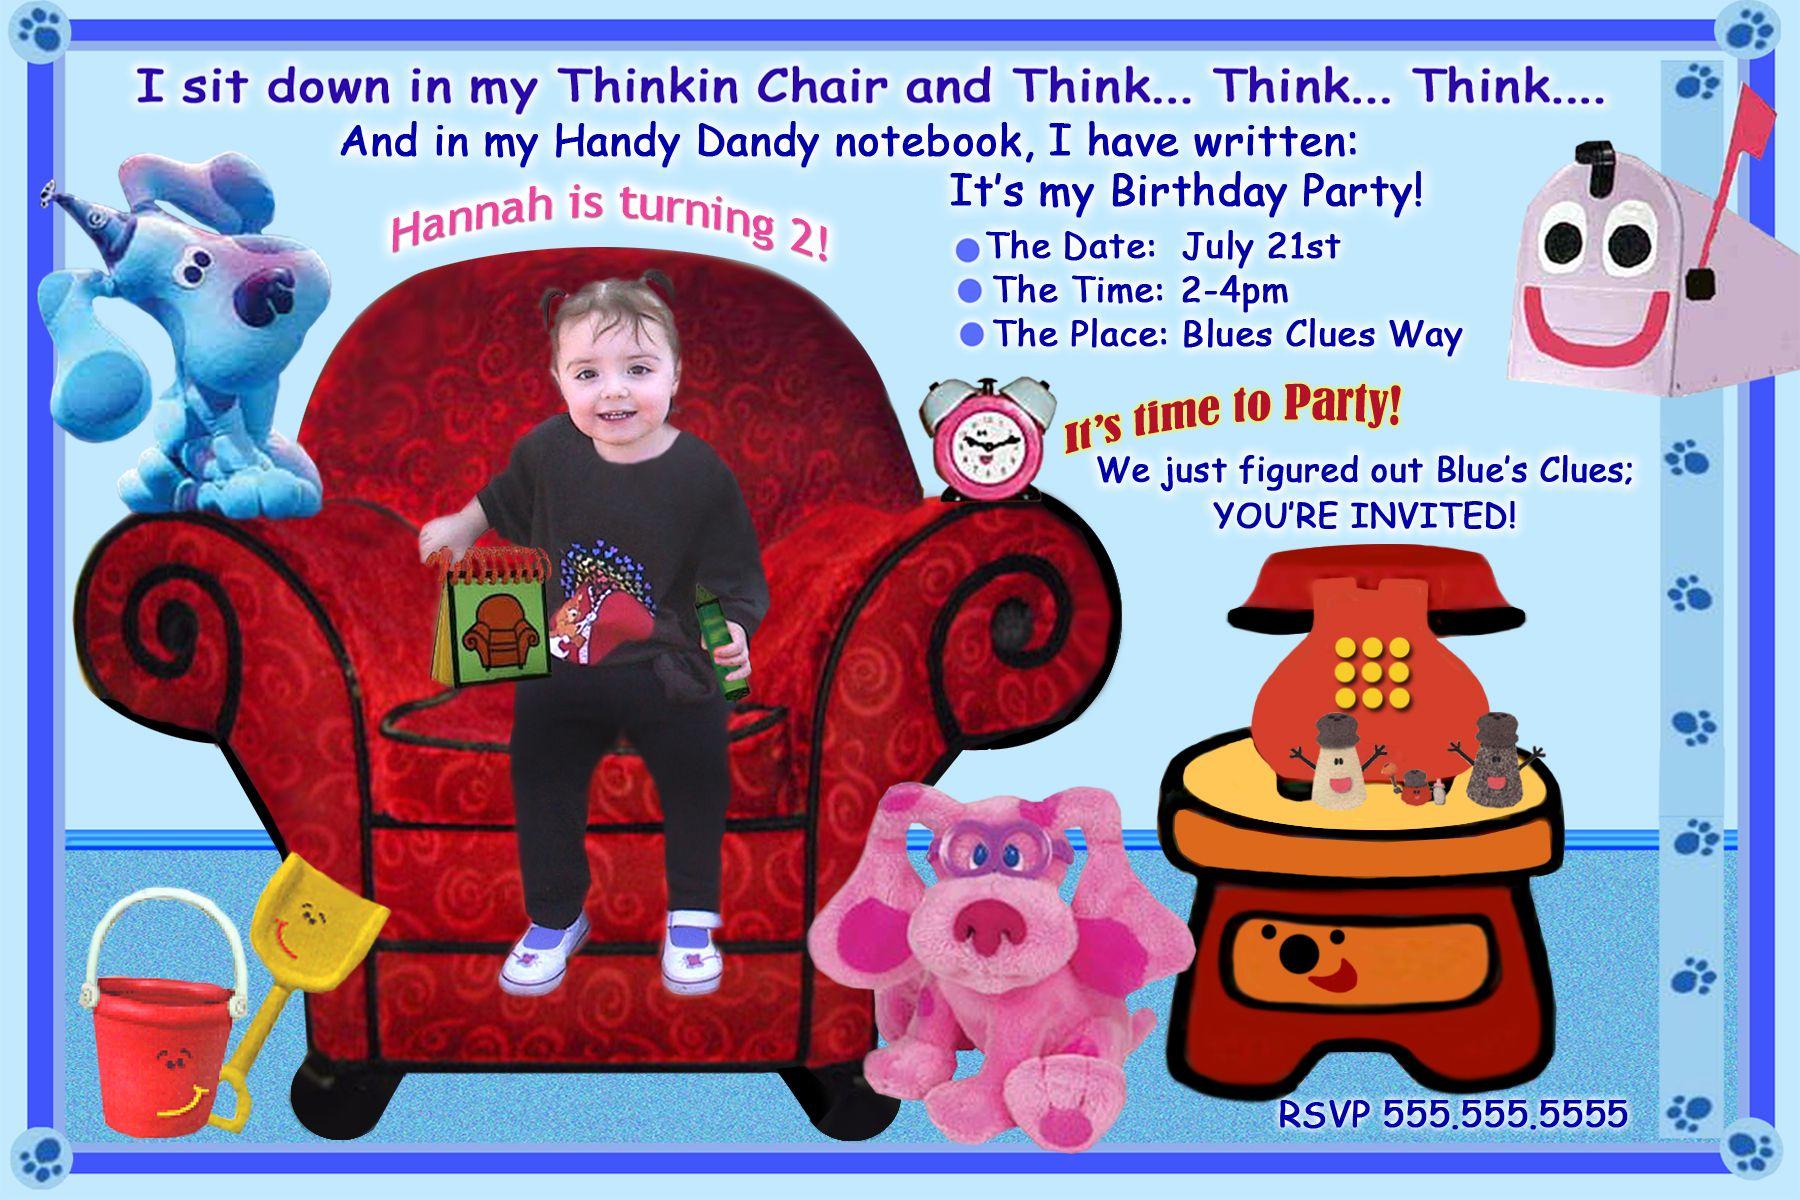 Free Blues Clues Birthday Invitations Ideas | Bagvania Invitation - Blue's Clues Invitations Free Printable